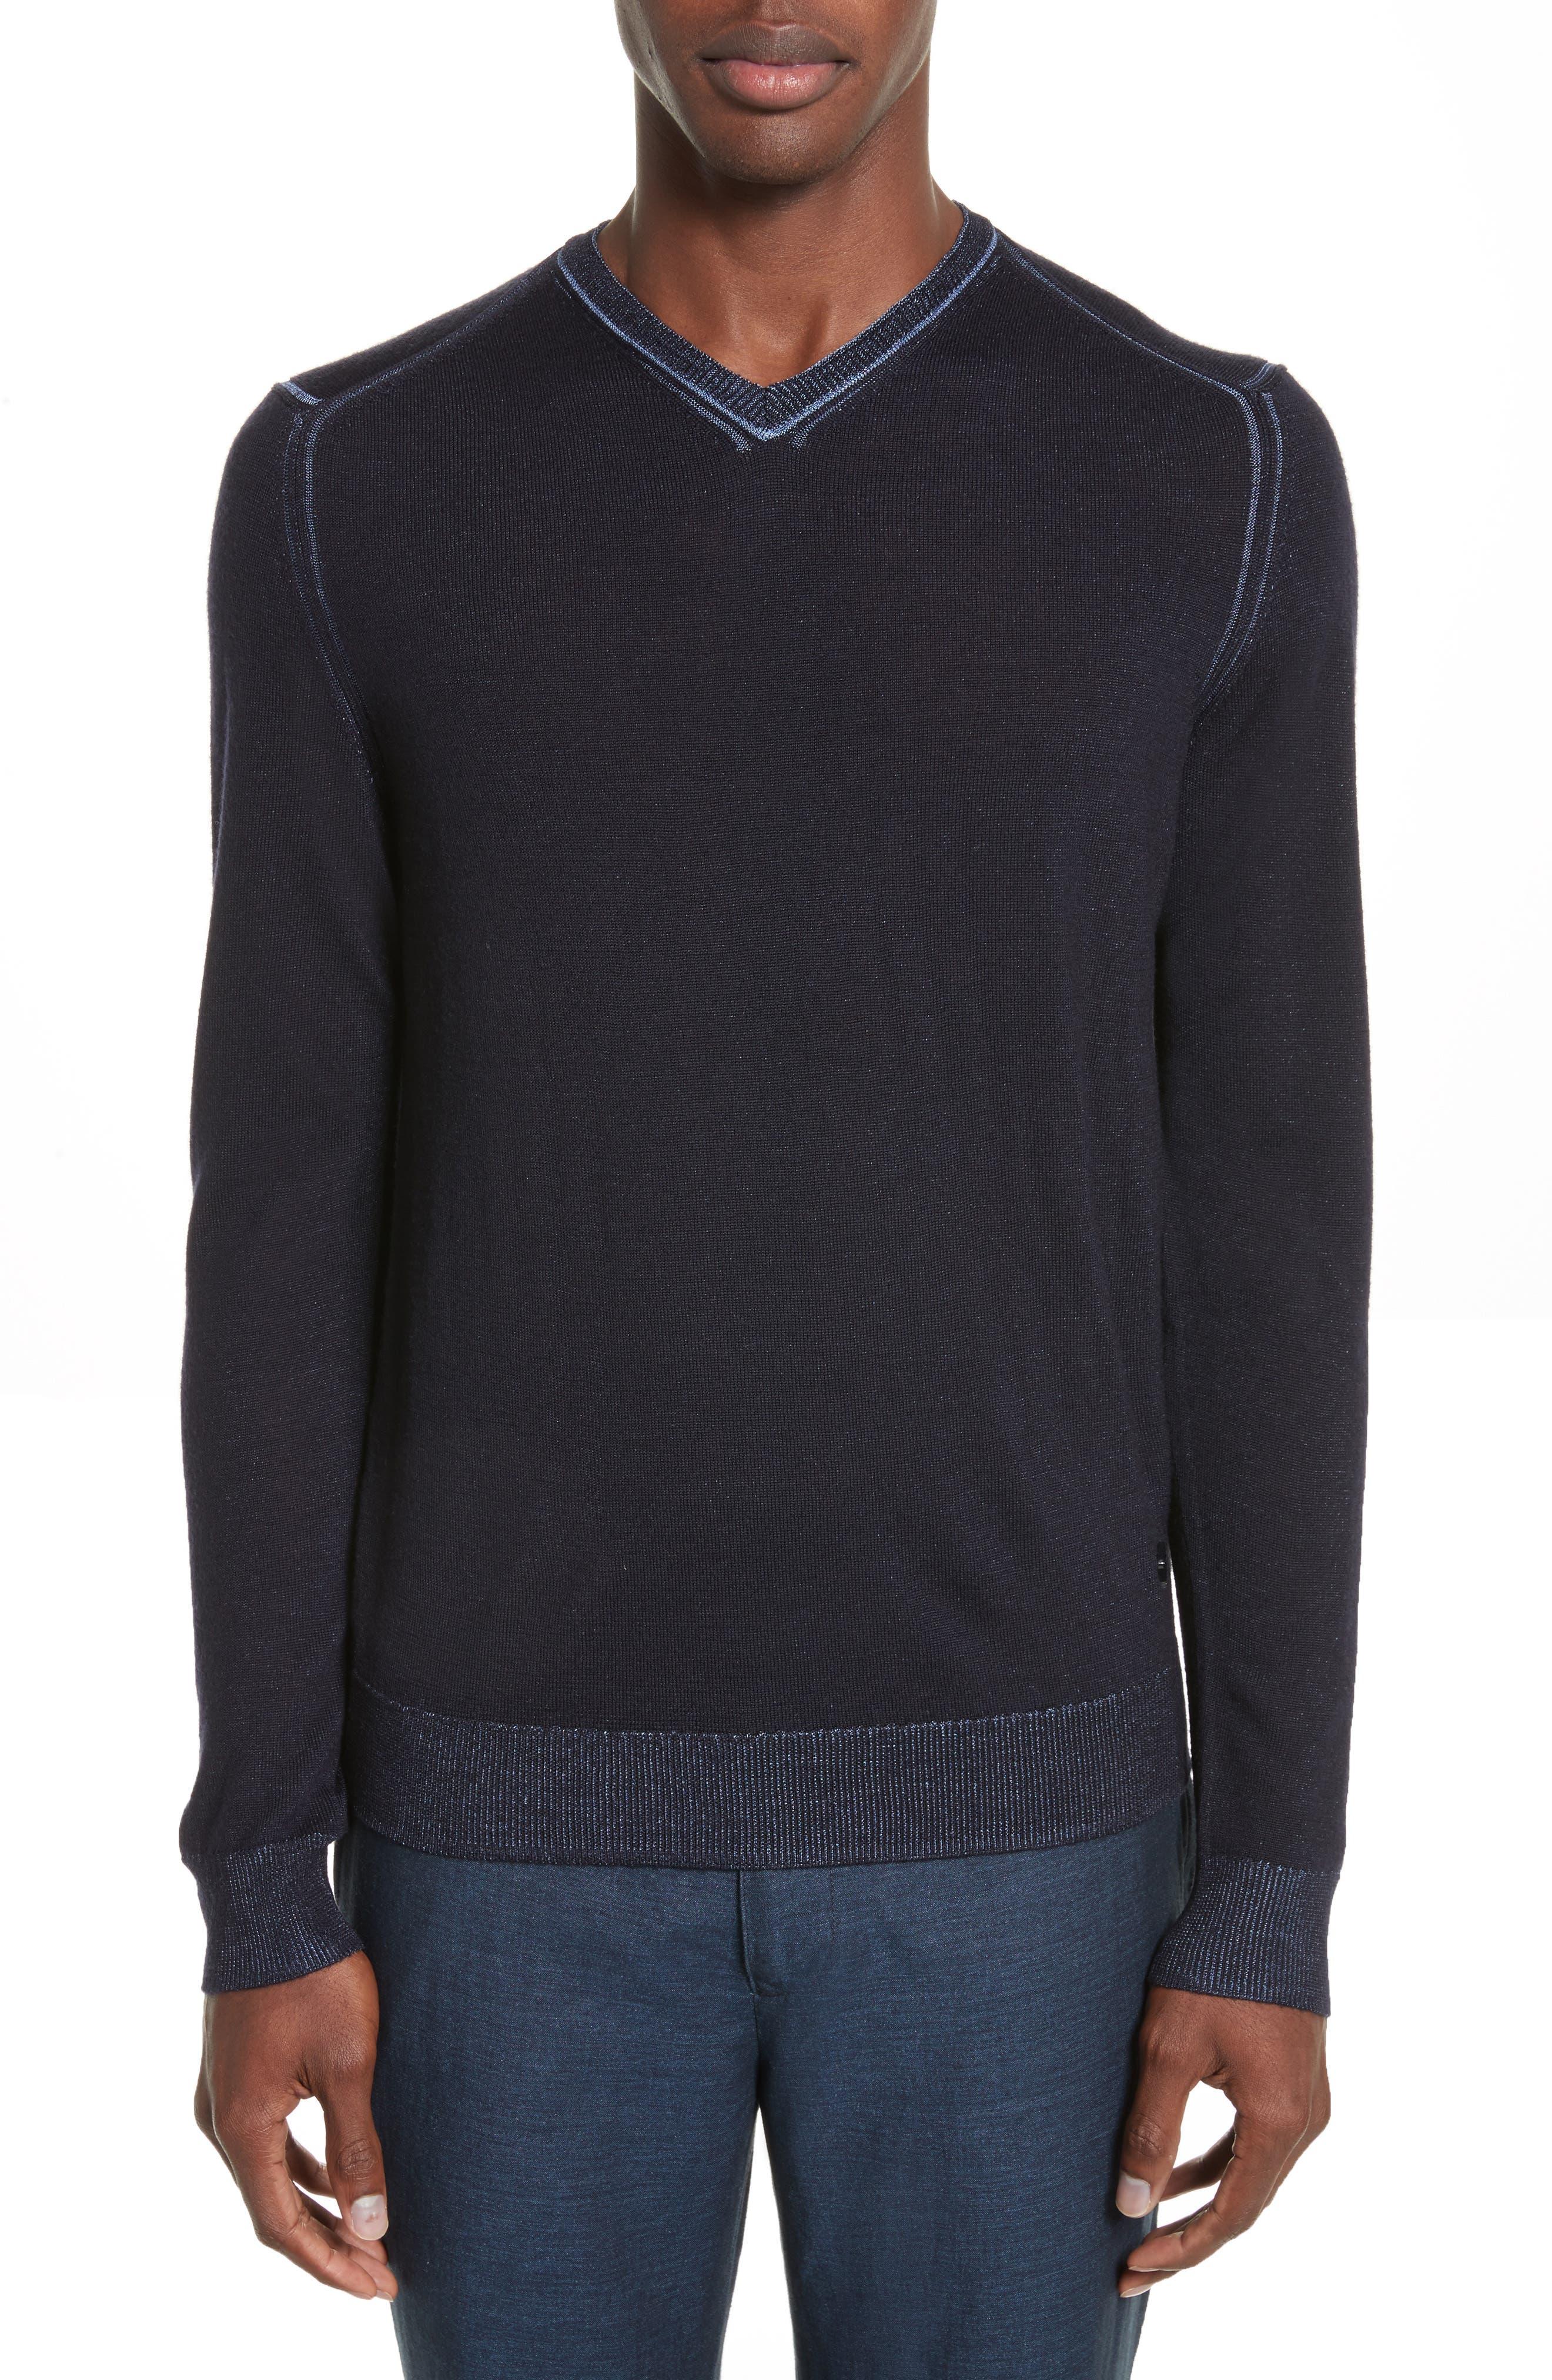 AJ V-Neck Sweater,                         Main,                         color,